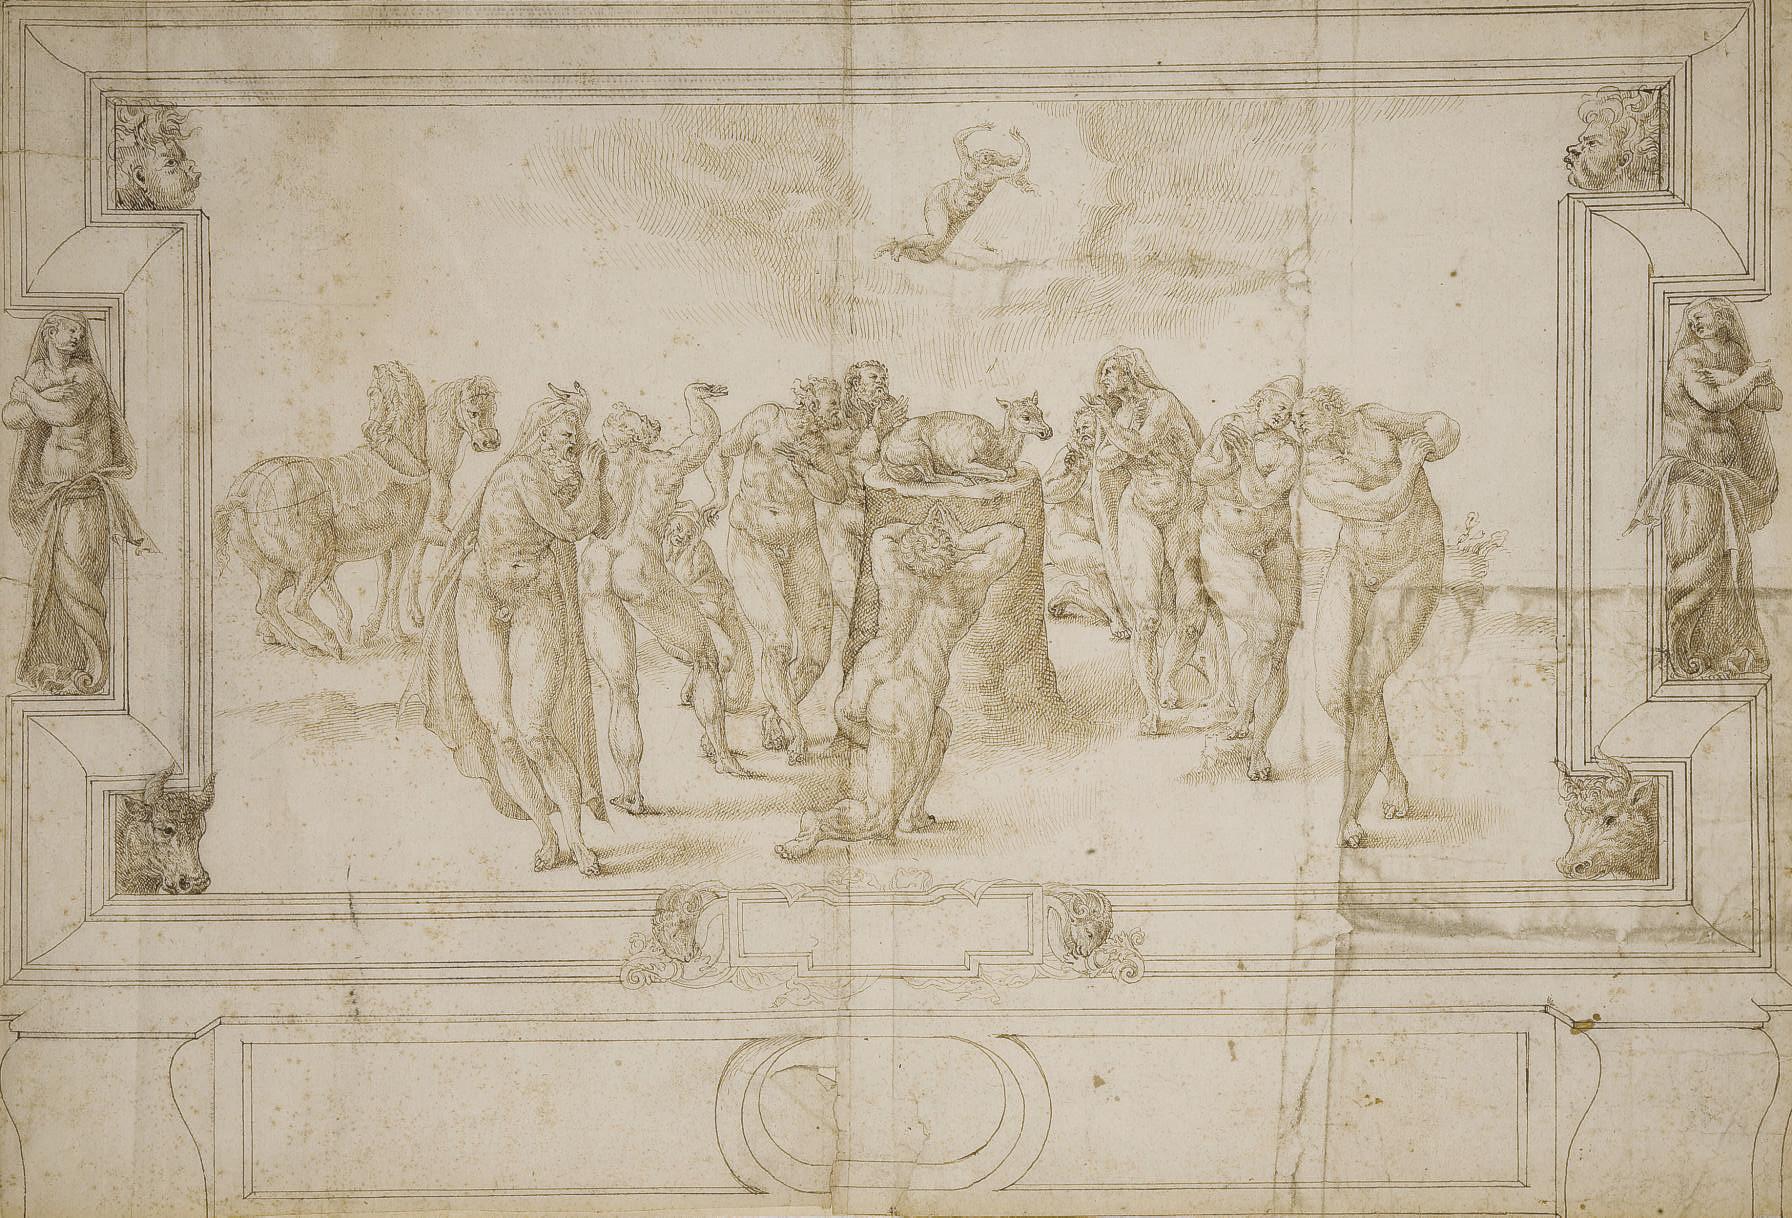 ARTISTE ITALIEN ACTIF EN FRANC